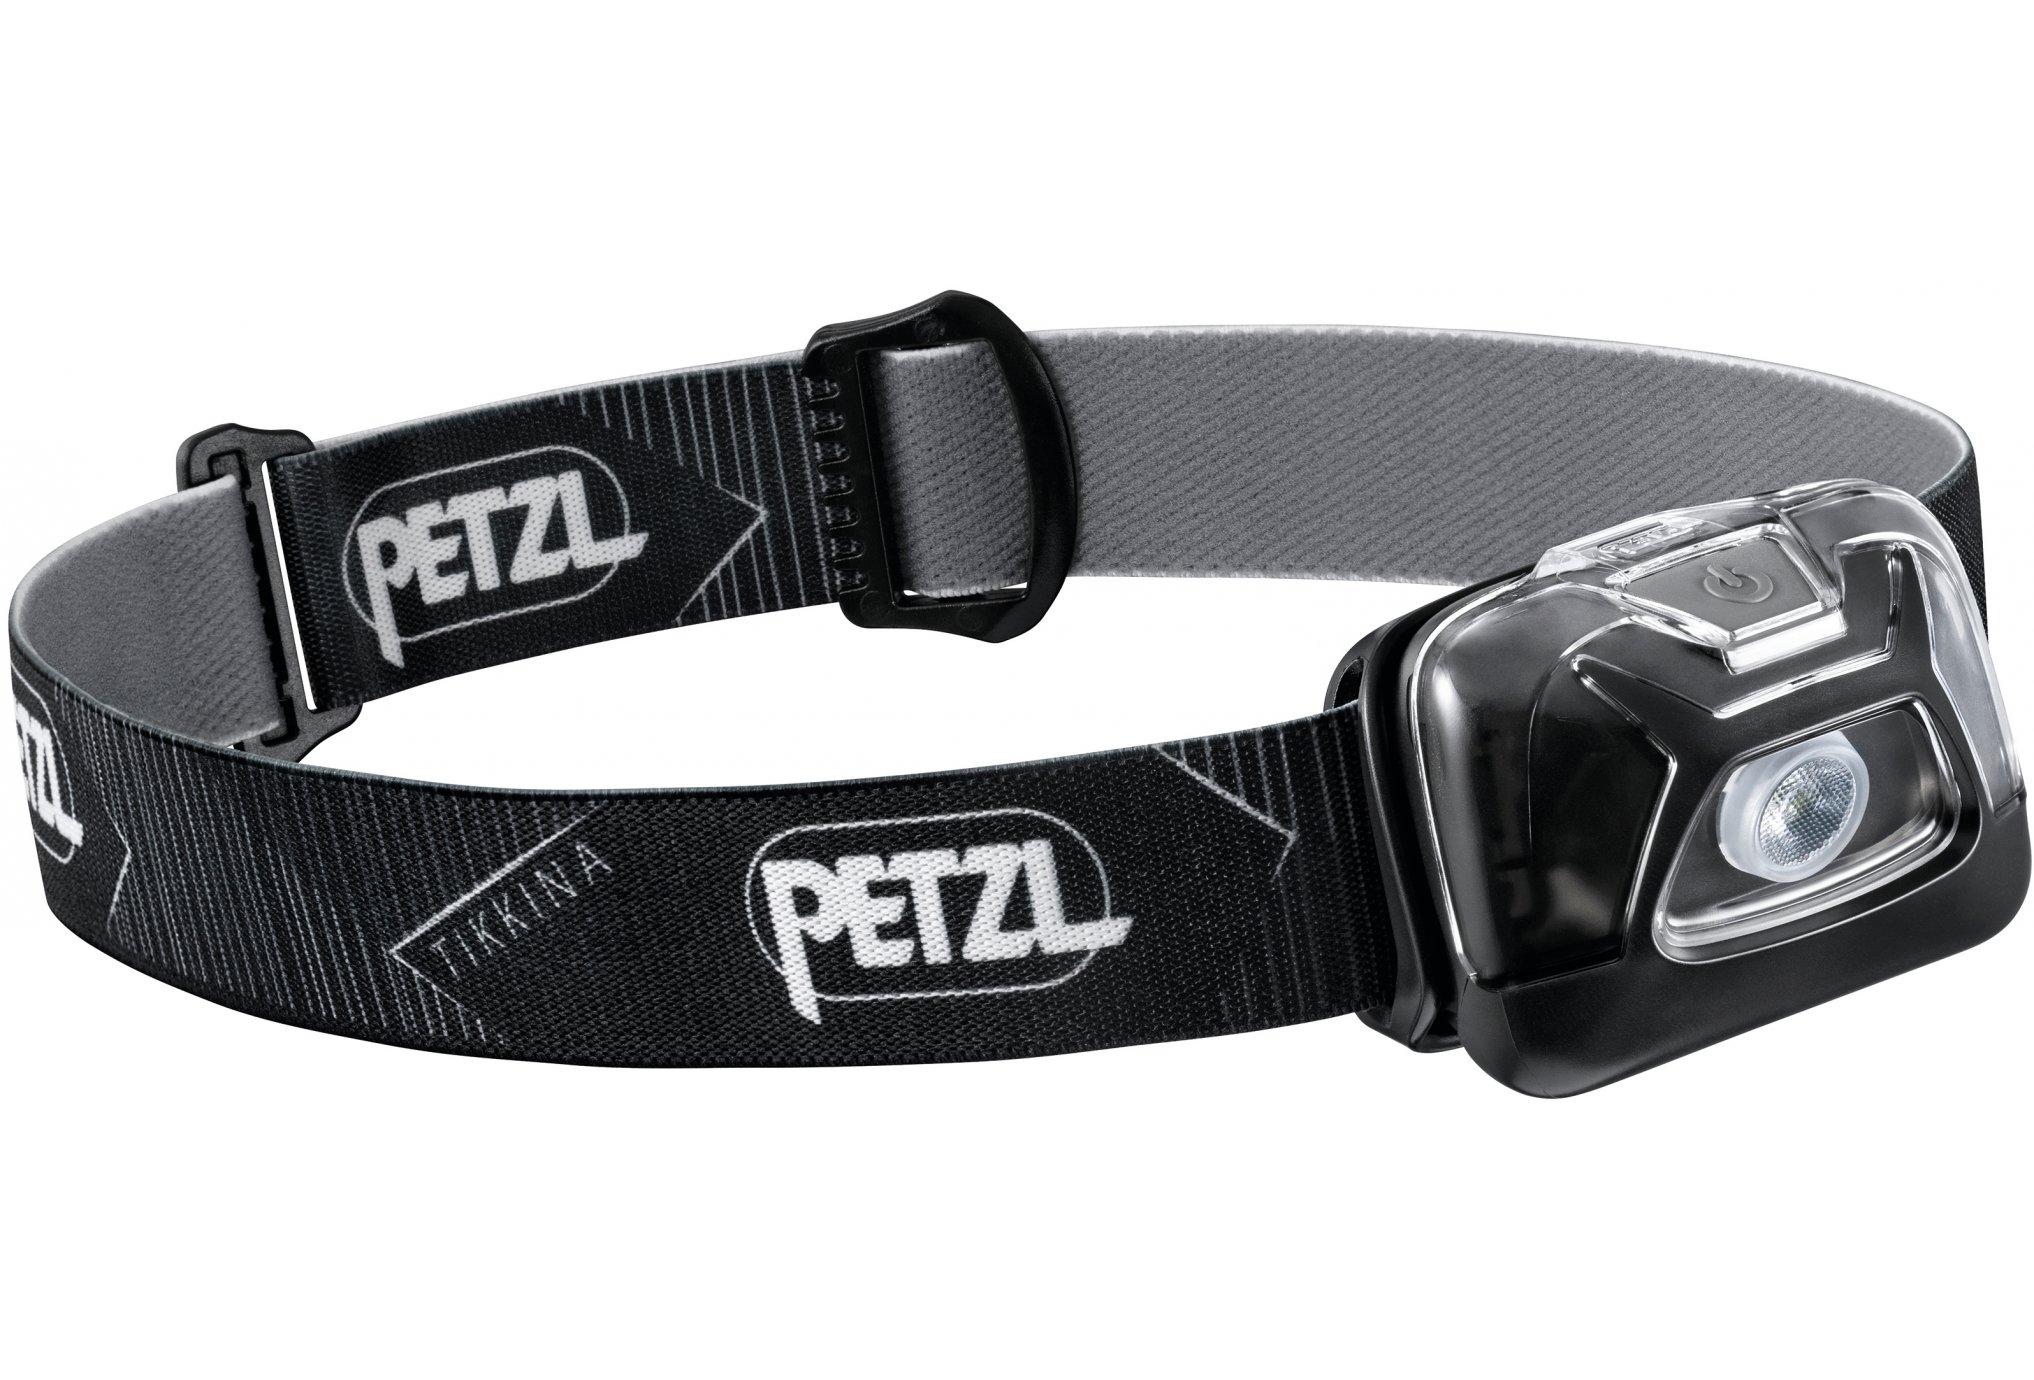 Petzl Tikkina - 250 lumens Lampe frontale / éclairage